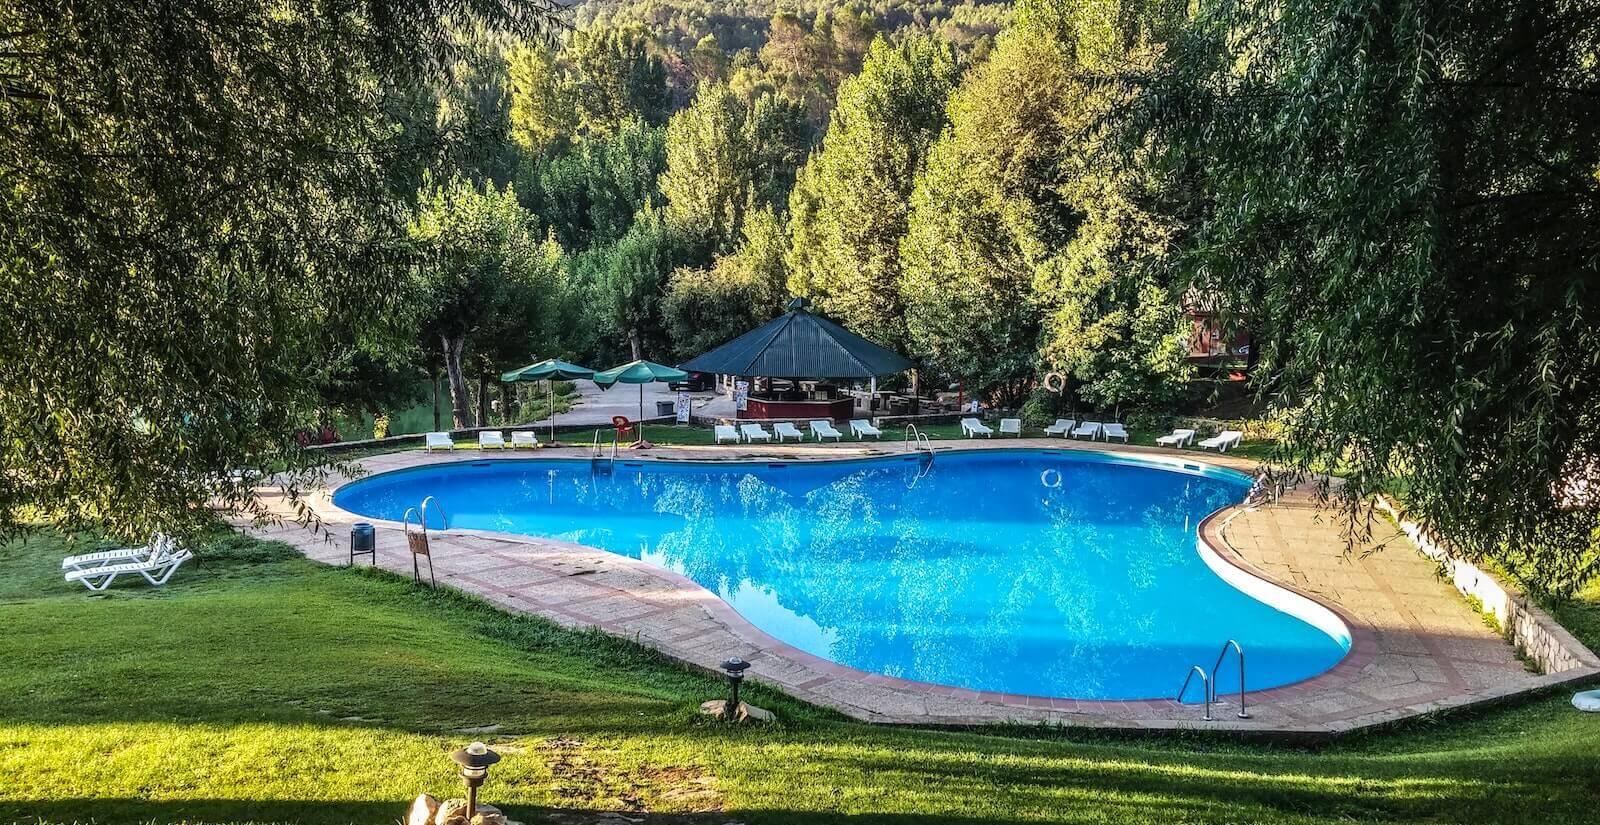 Spikeball im Pool - Wassersport mal anders